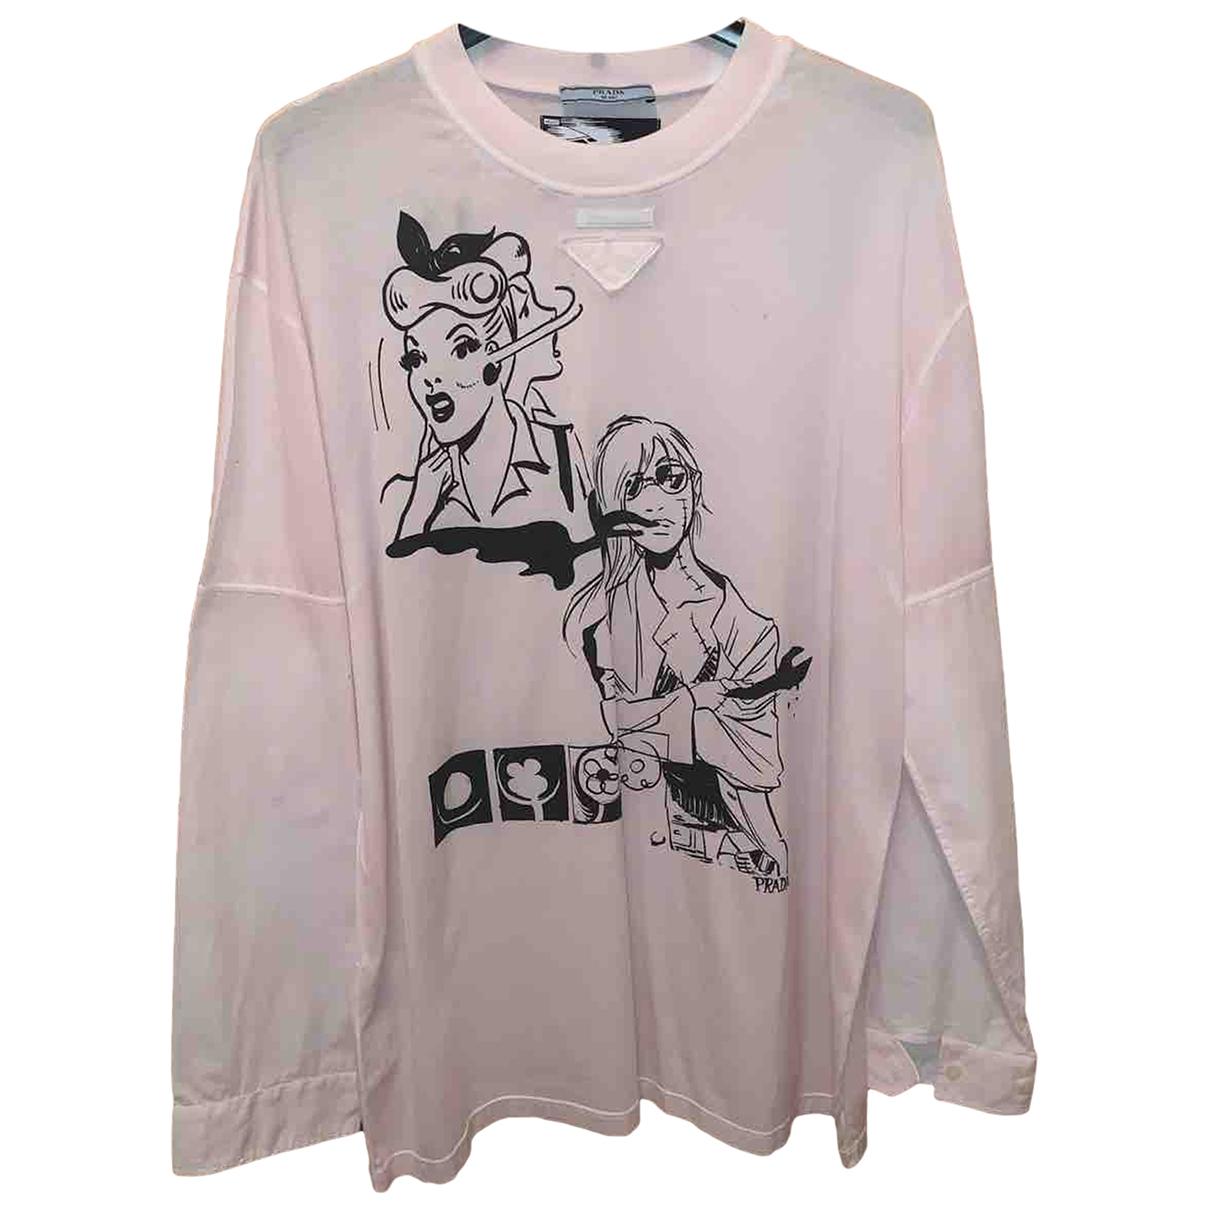 Prada - Tee shirts   pour homme en coton - rose